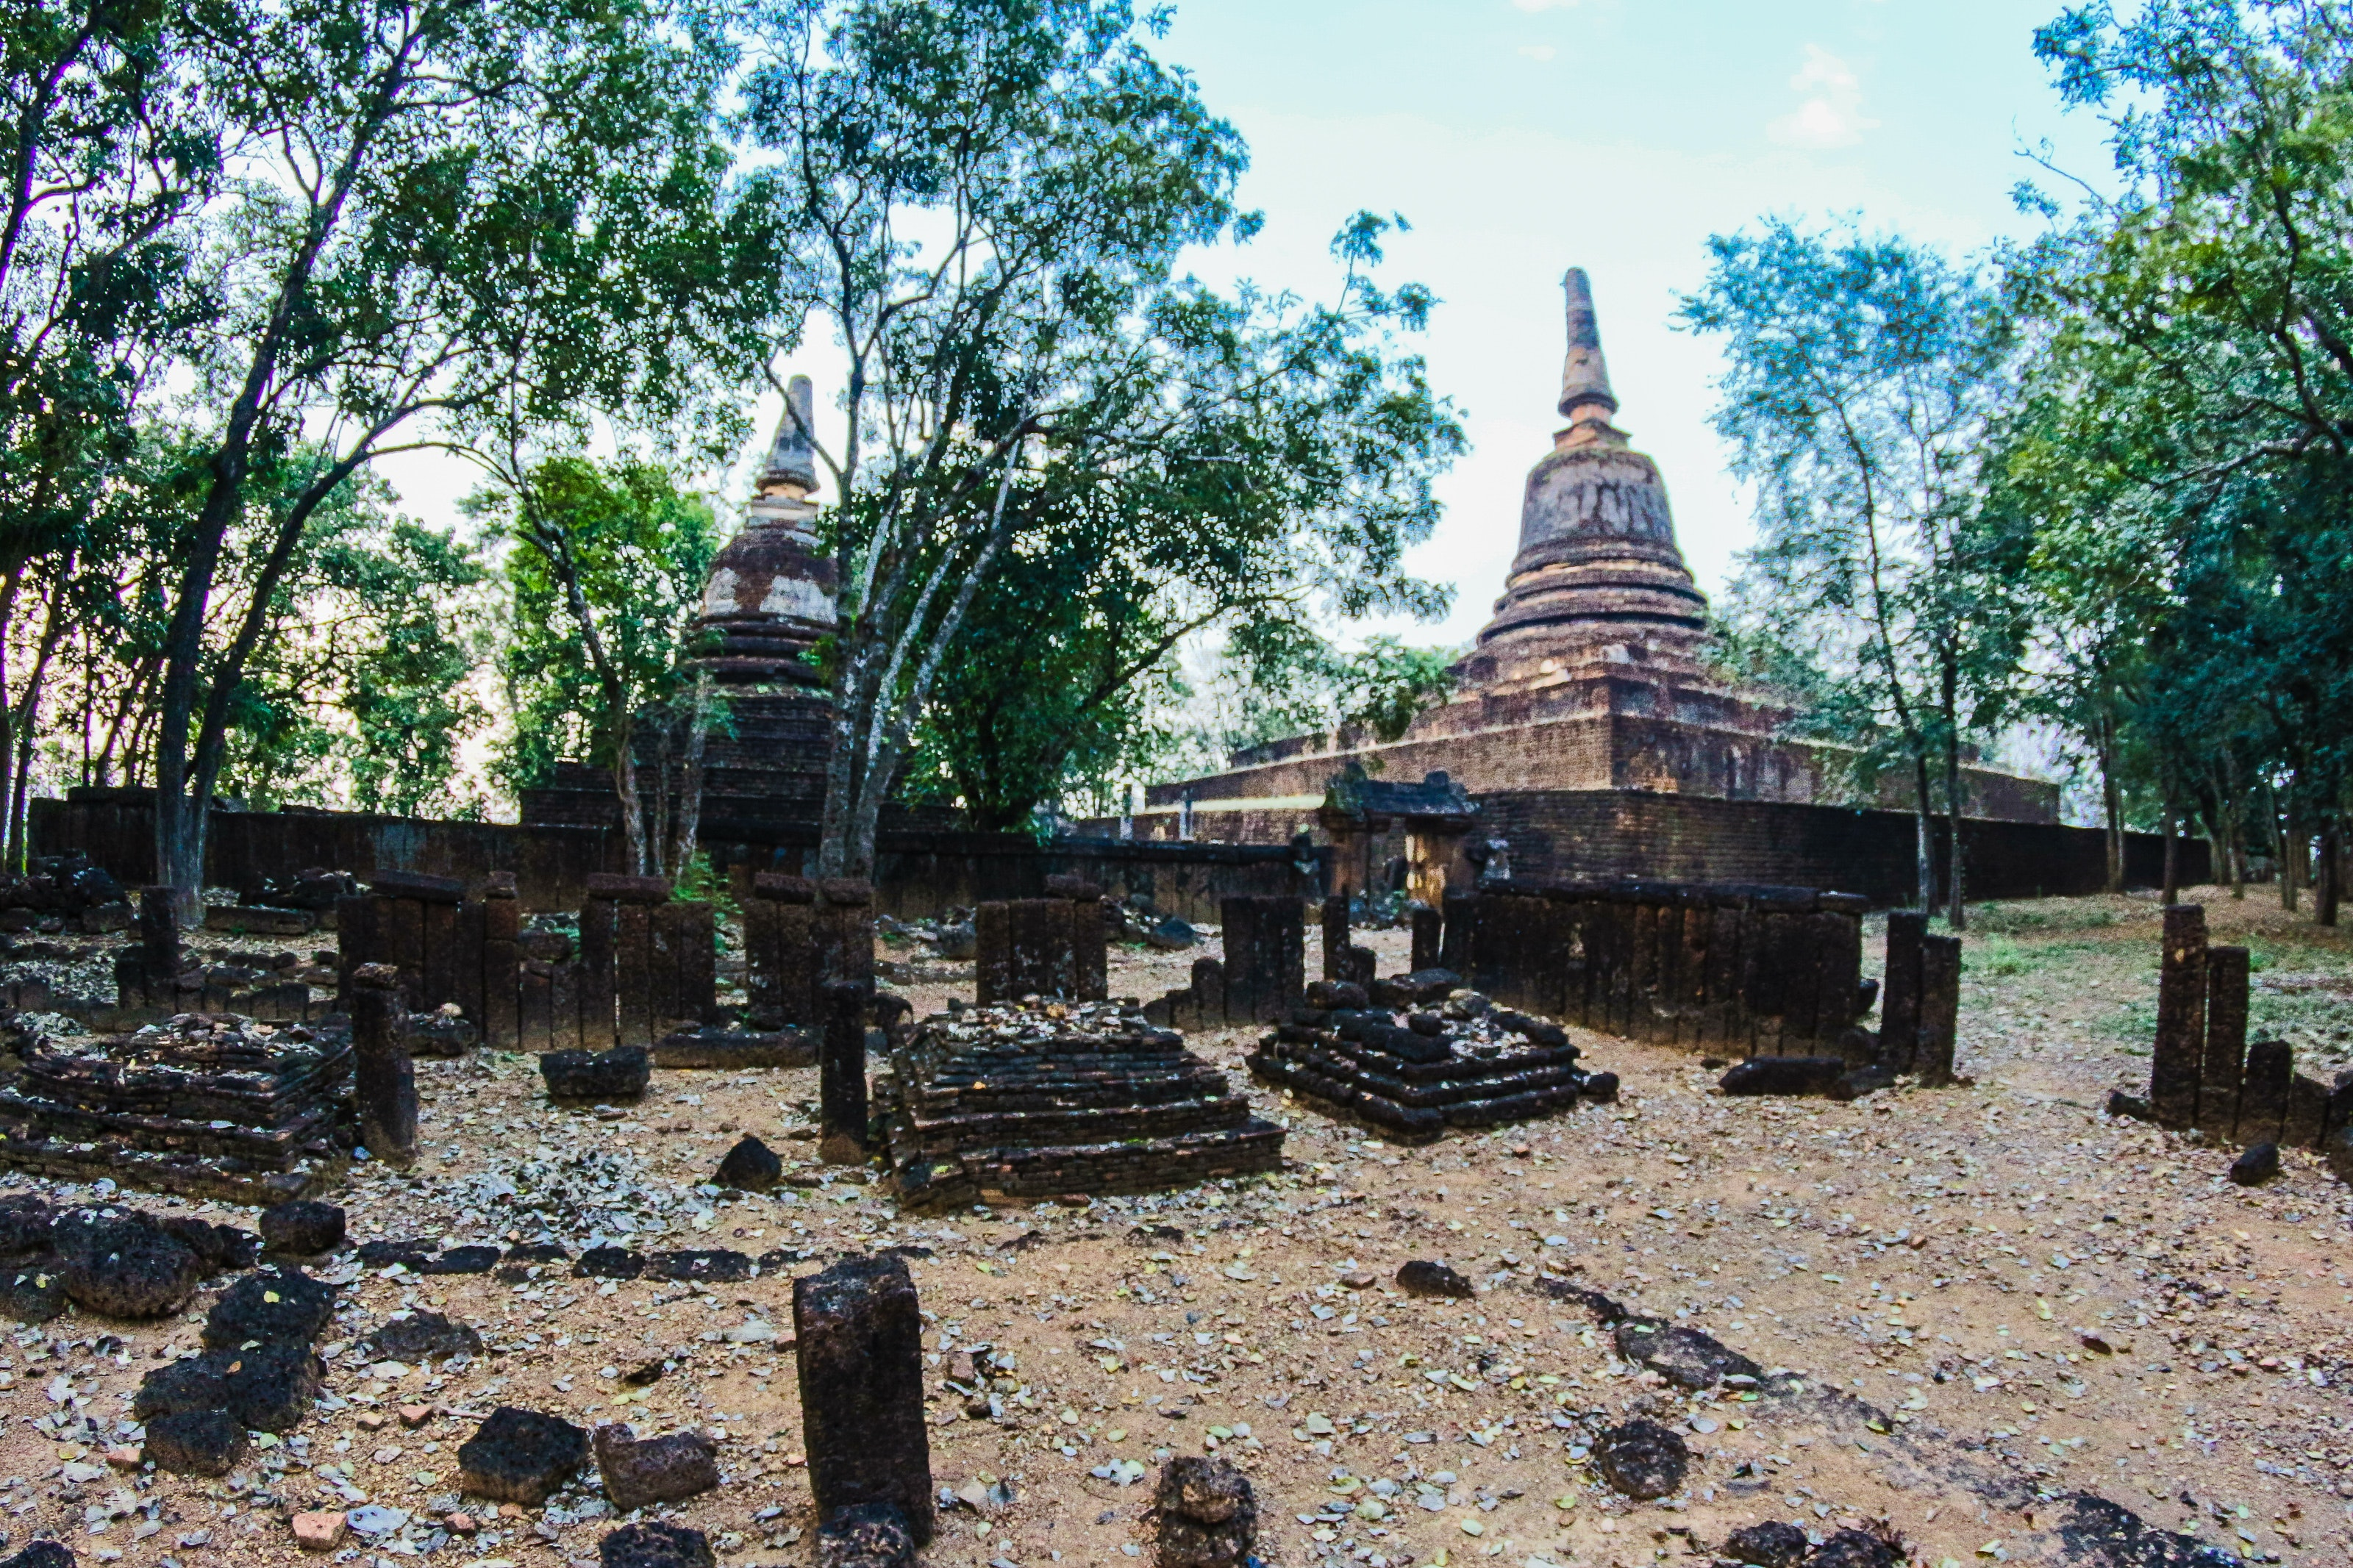 Photo of Brown Concrete Temple, Ancient, Thai, Sculpture, Spiritual, HQ Photo